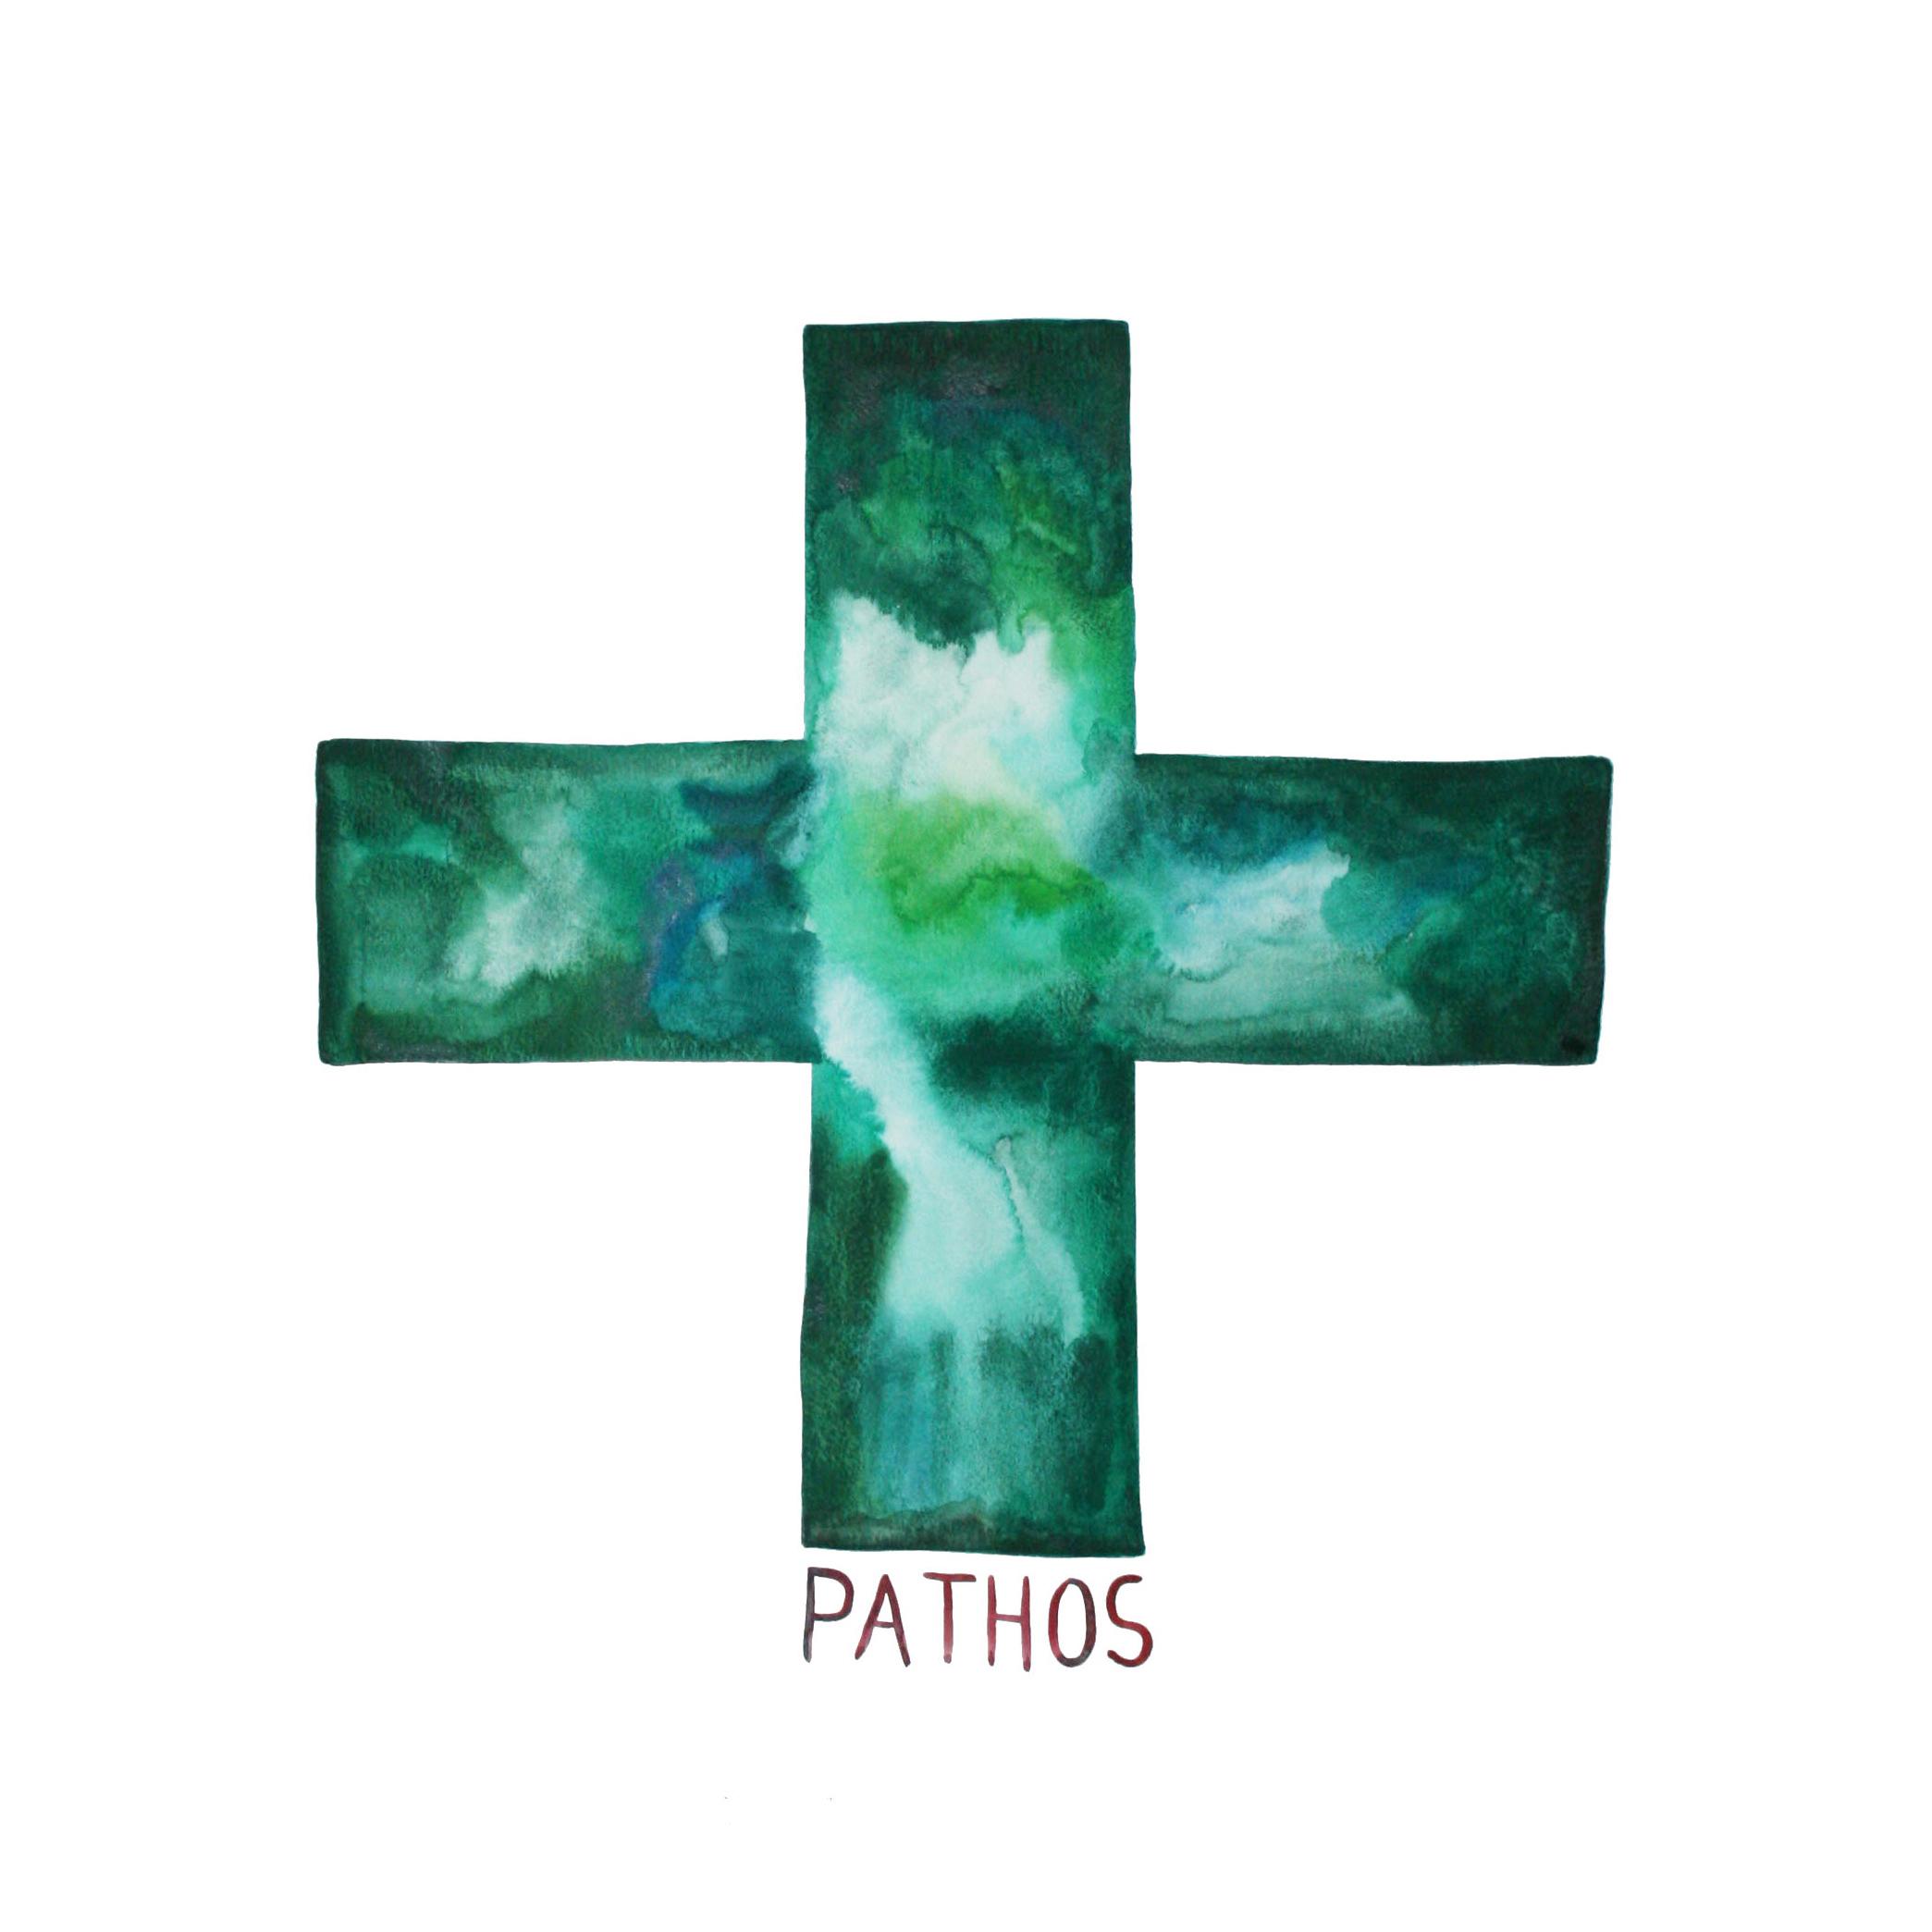 Pathos  , 2014, watercolor on paper, 50x50cm